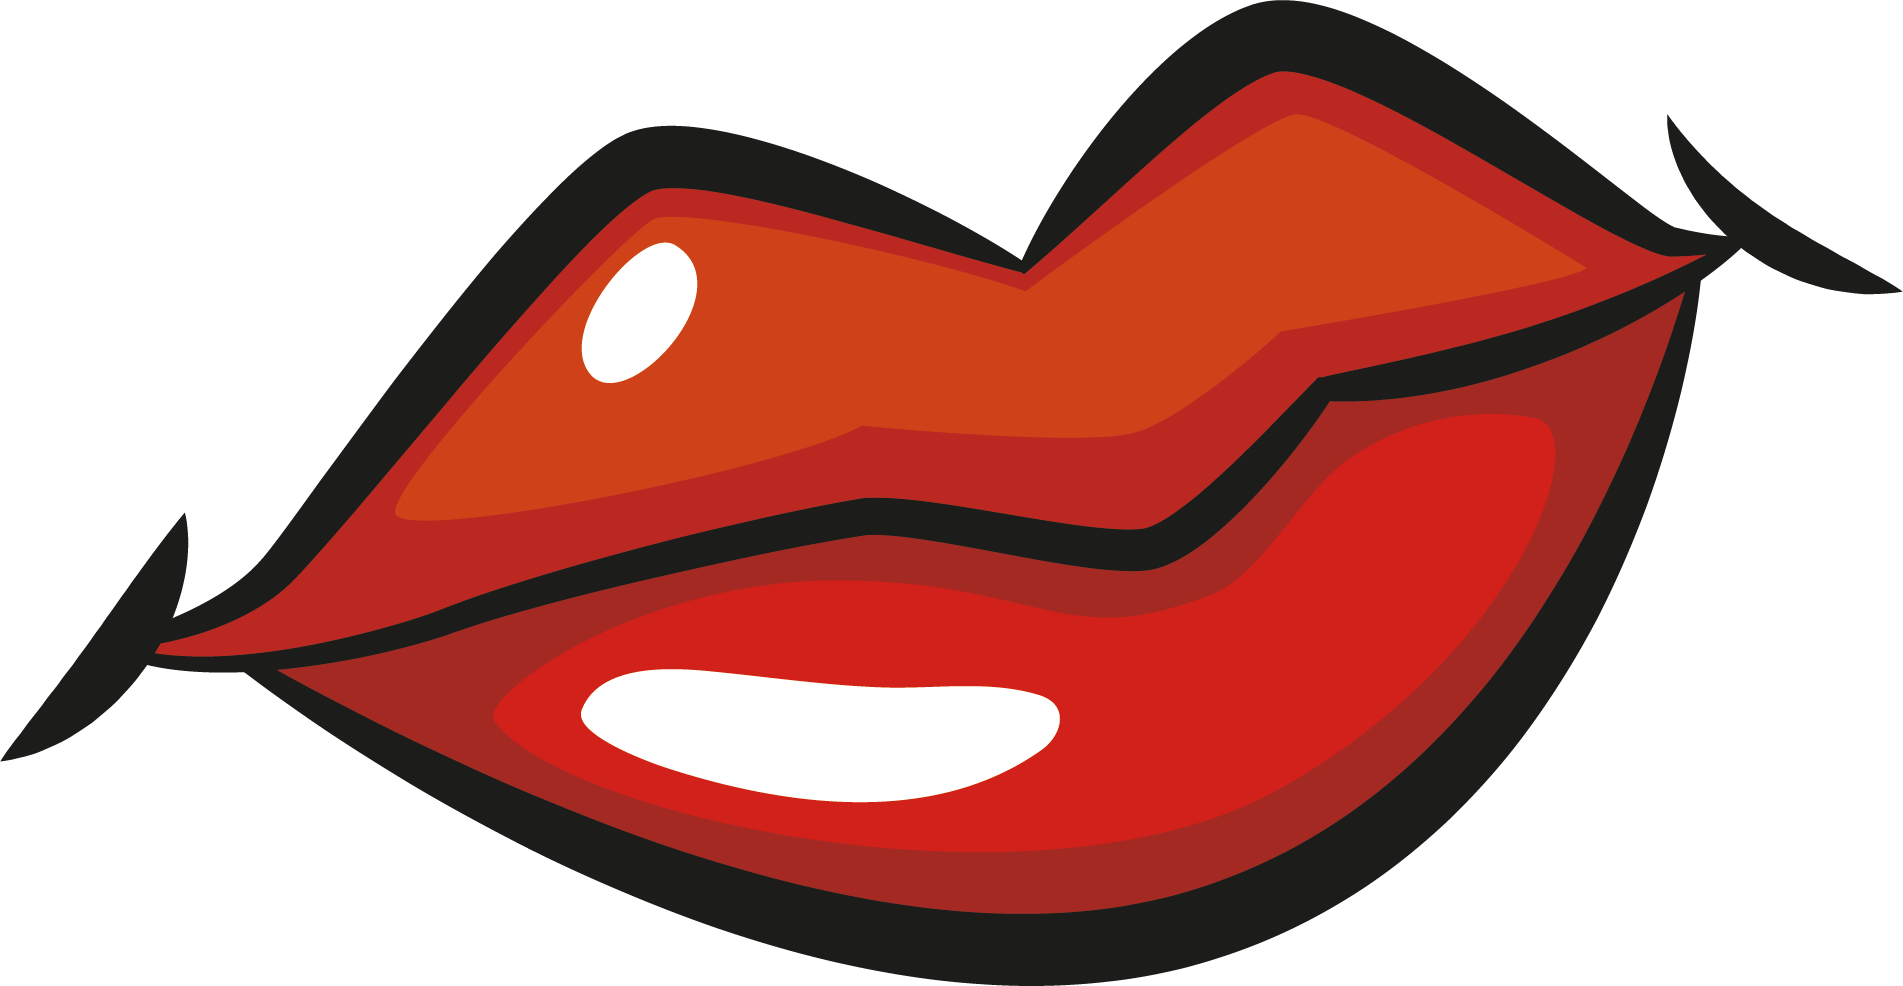 image free download Bean drawing mouth. Lip gloss clipart at